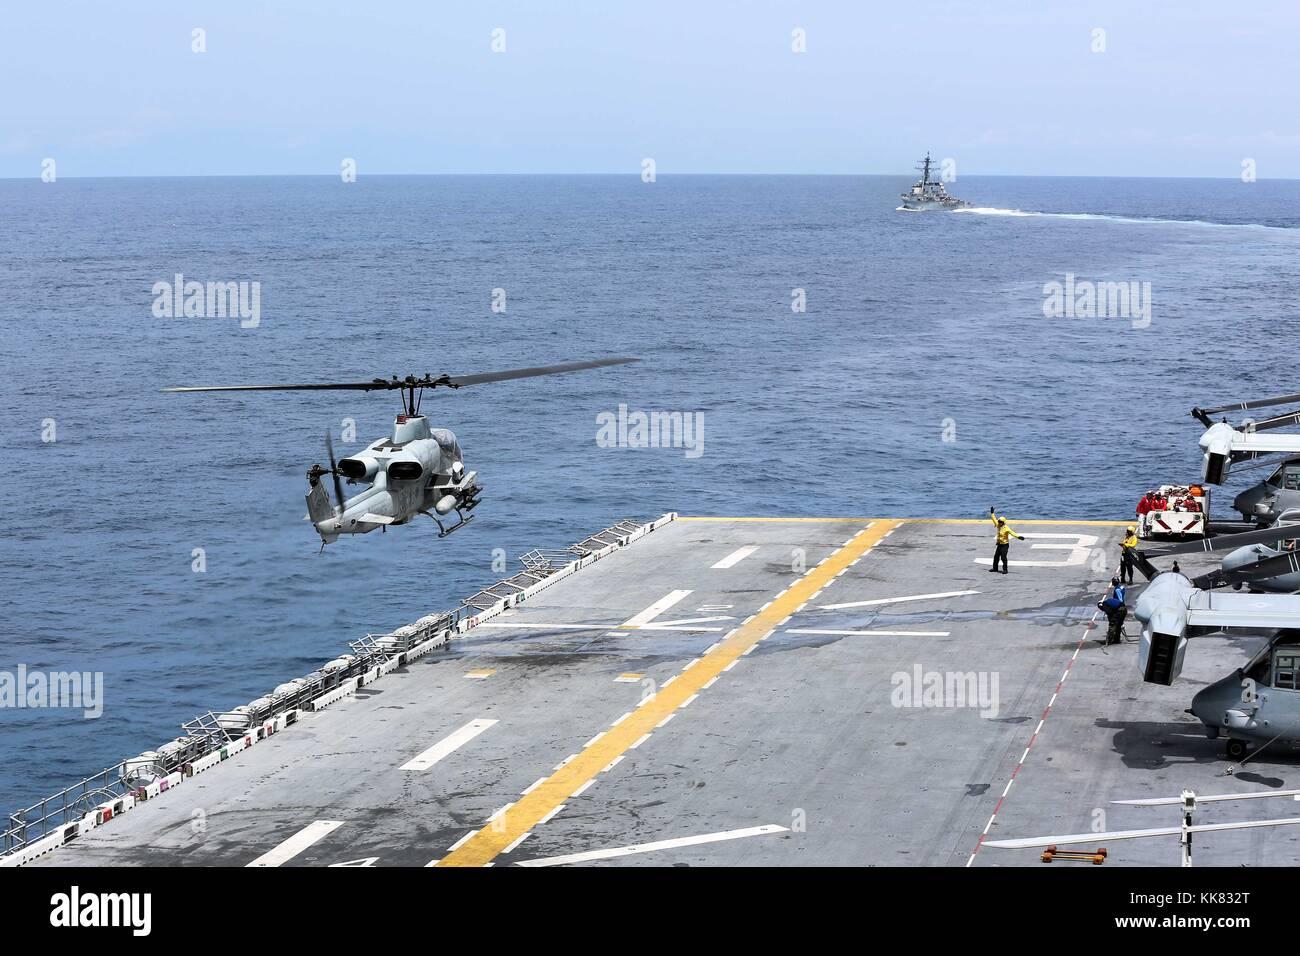 An AH-1 Cobra helicopter lands on the flight deck of the amphibious assault ship USS Kearsarge LHD 3, Atlantic Ocean. - Stock Image